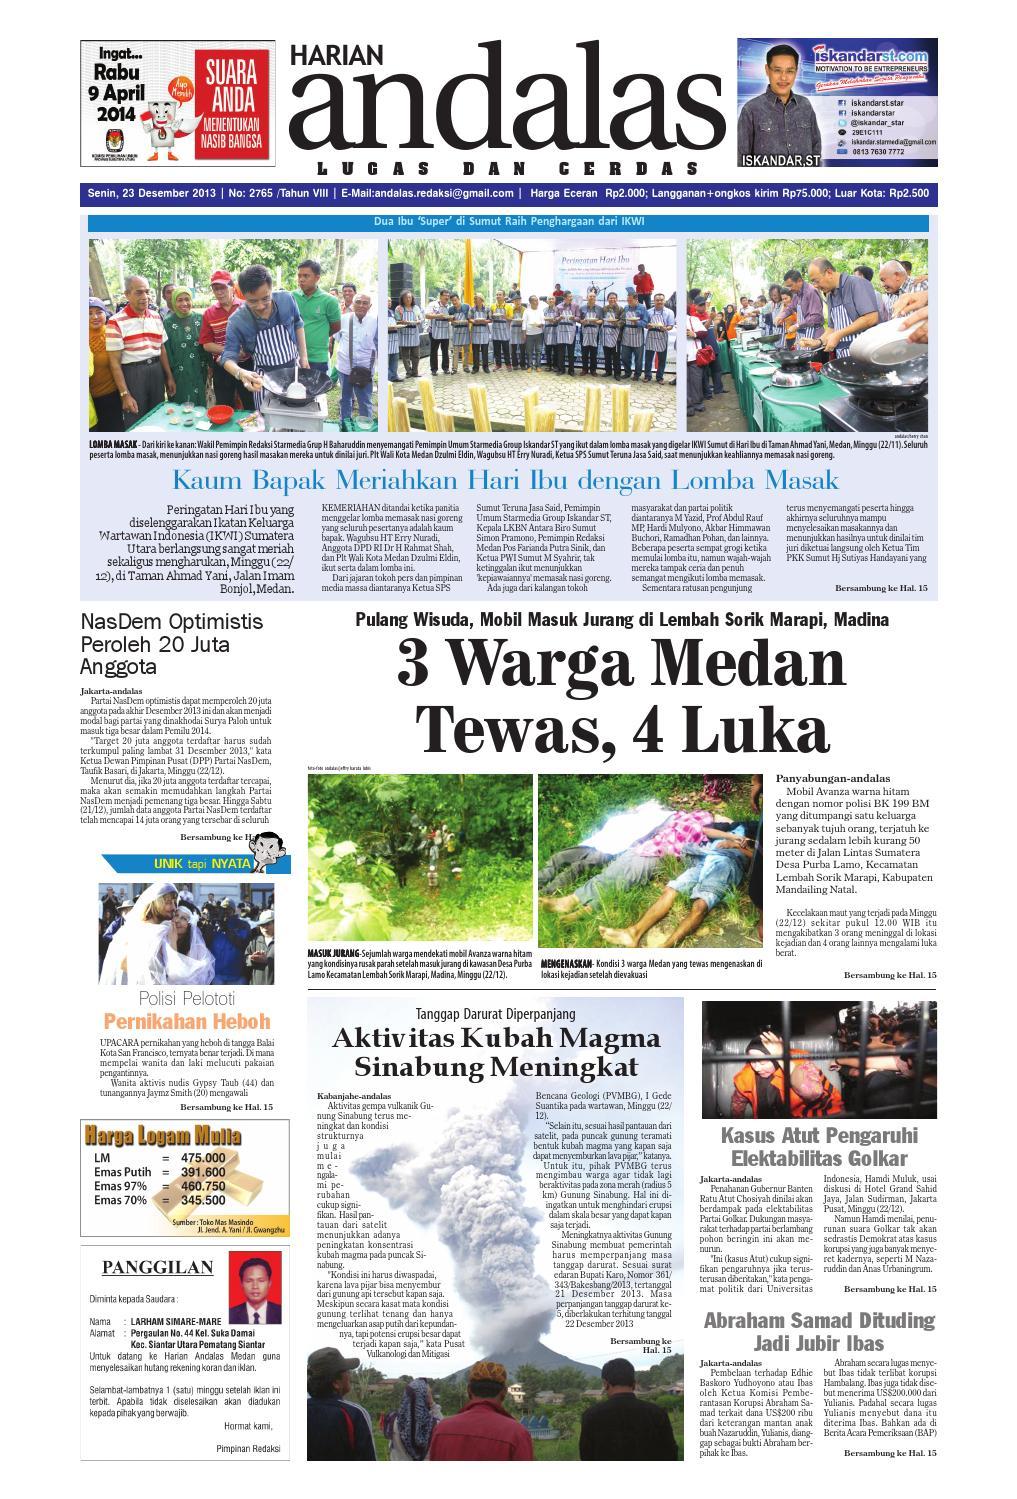 Epaper Andalas Edisi Senin 23 Desember 2013 By Media Issuu Fcenter Lemari Pakaian Wd Hk 1802 Sh Jawa Tengah